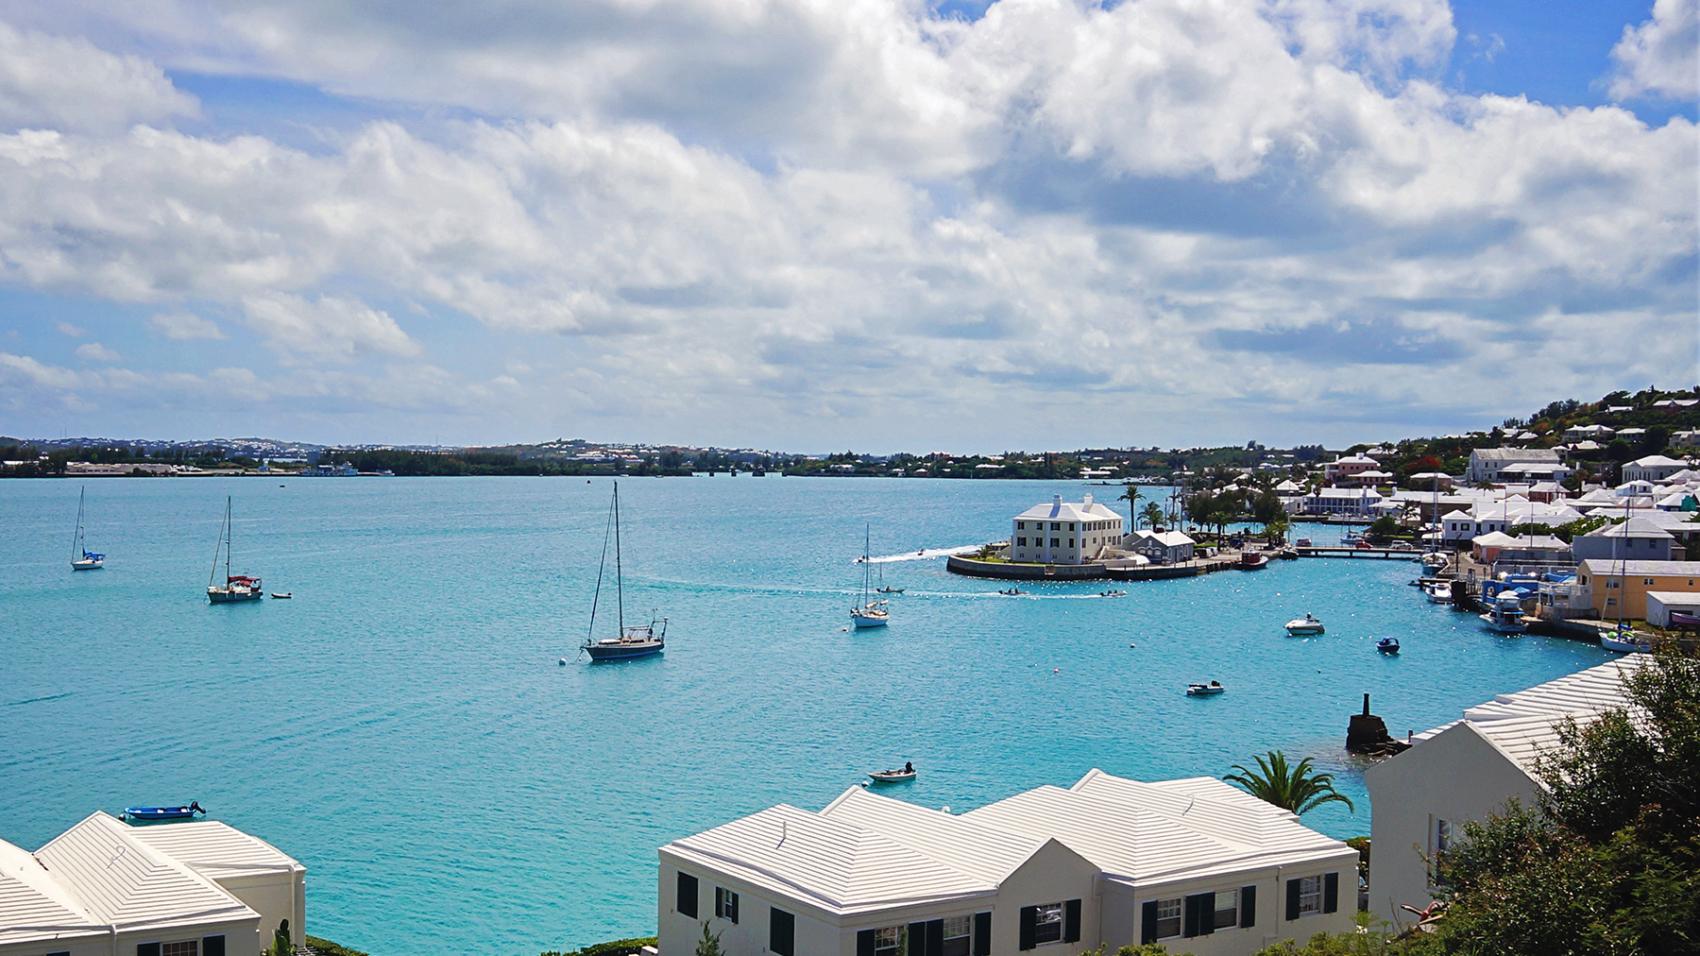 Serendipity in St. George's Harbor, Bermuda